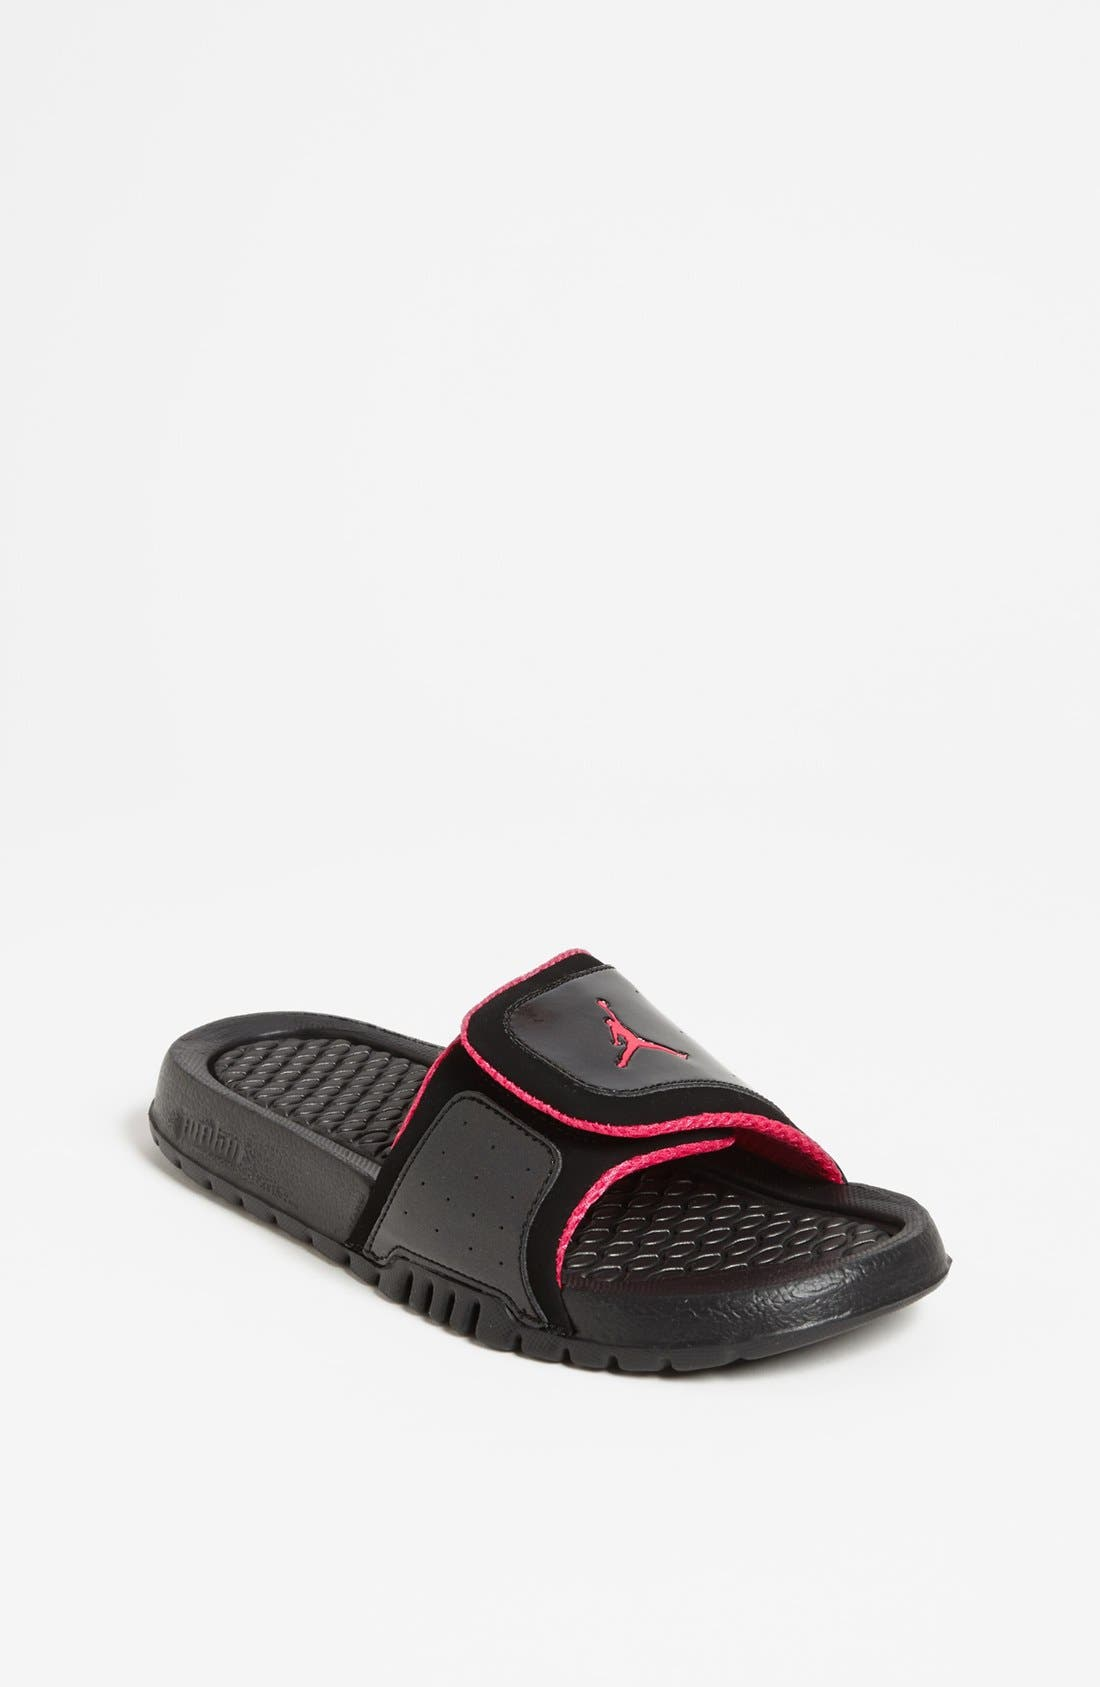 Main Image - Nike 'Jordan Hydro II' Sandal (Big Kid)